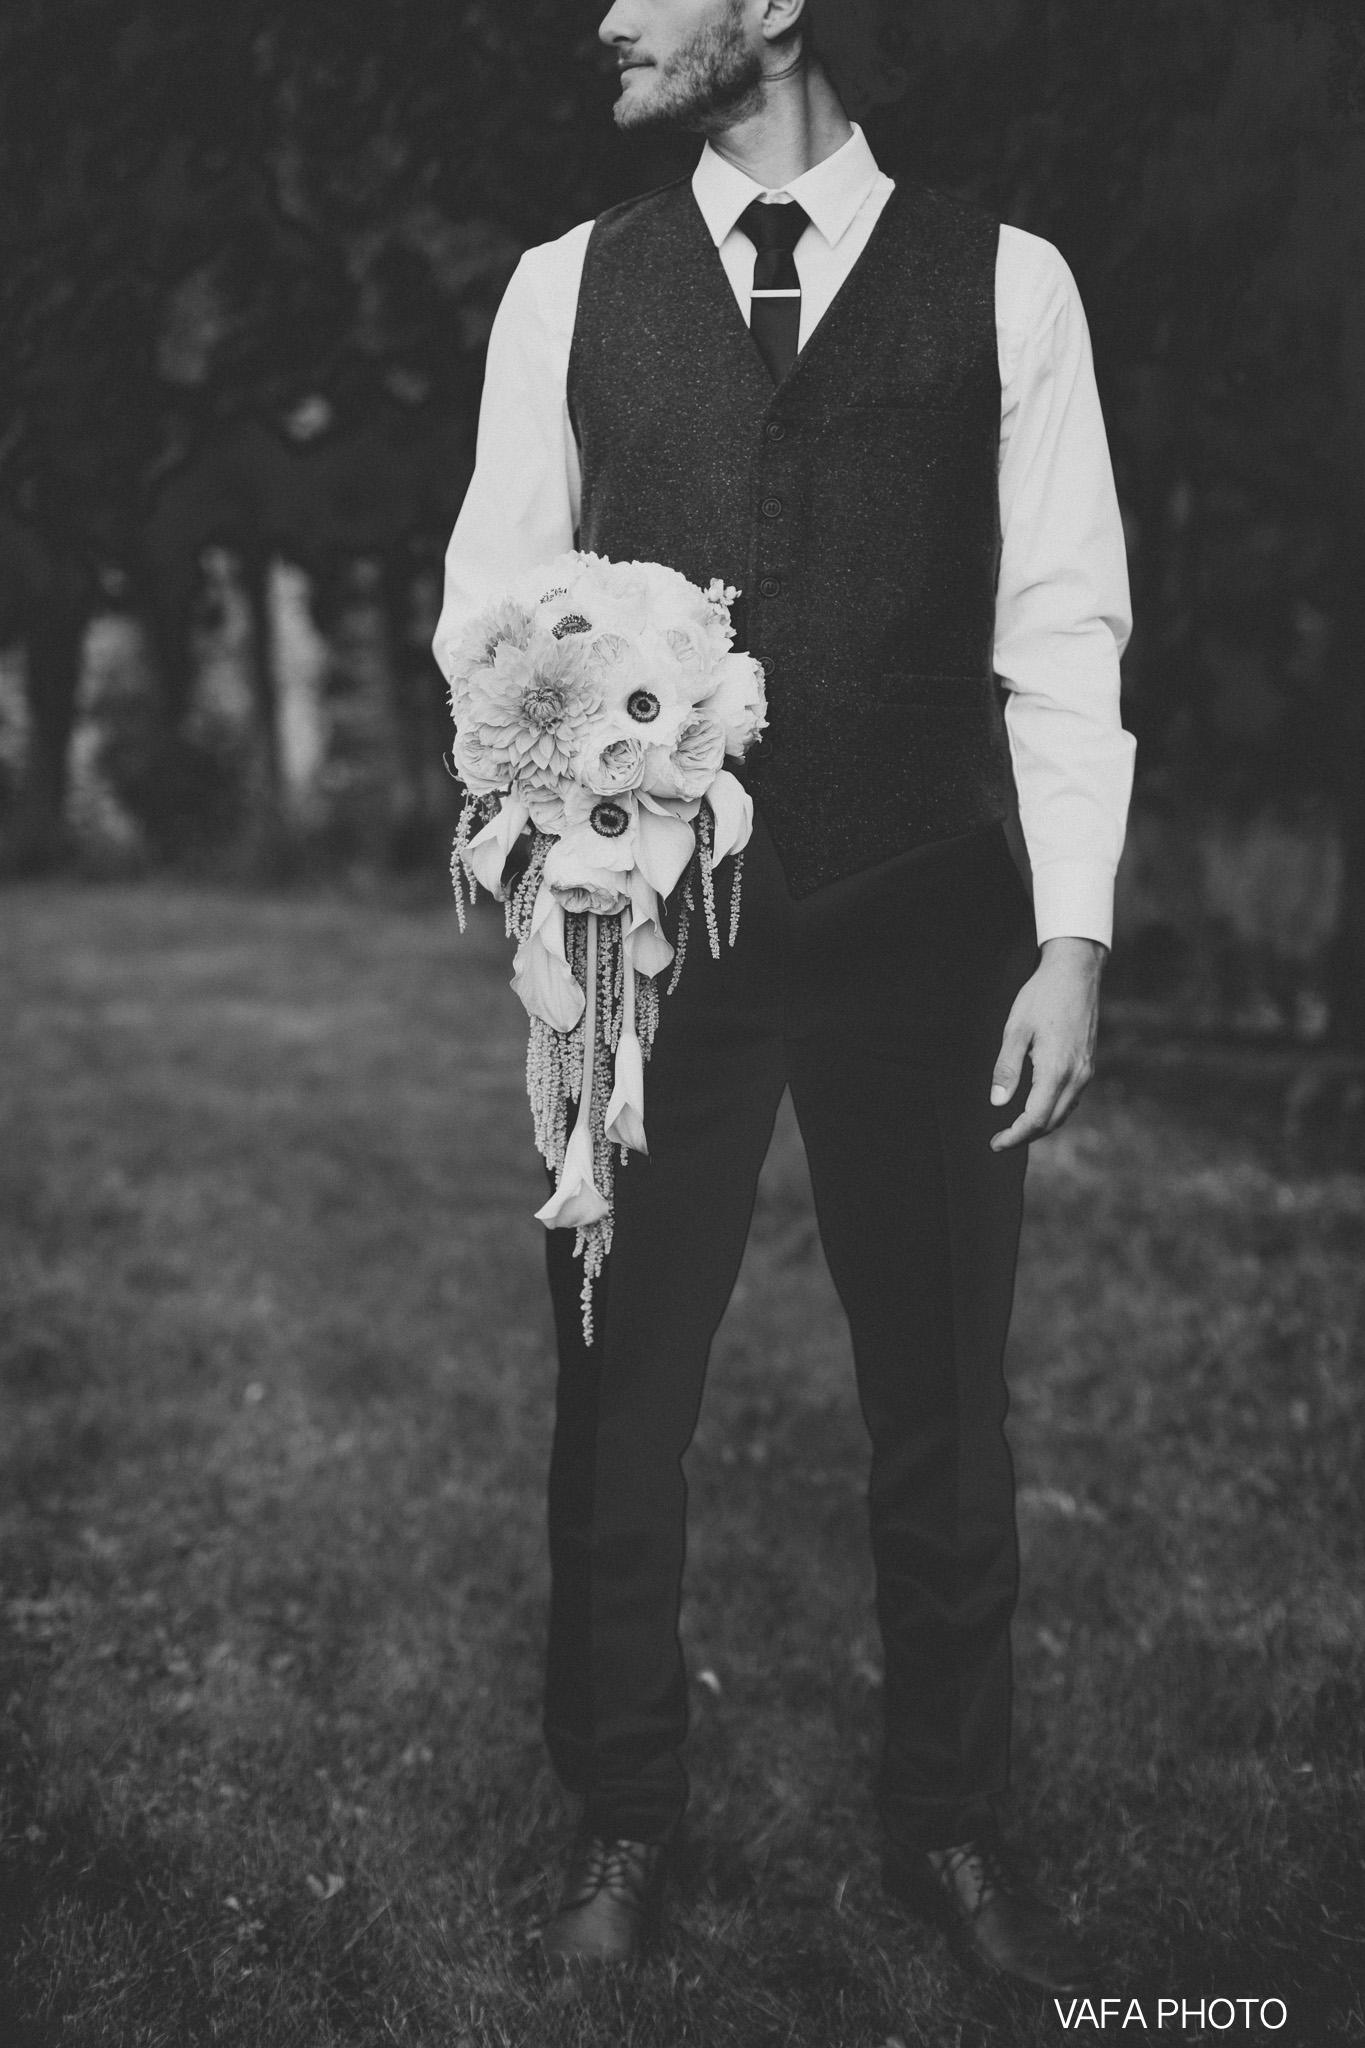 The-Felt-Estate-Wedding-Kailie-David-Vafa-Photo-684.jpg